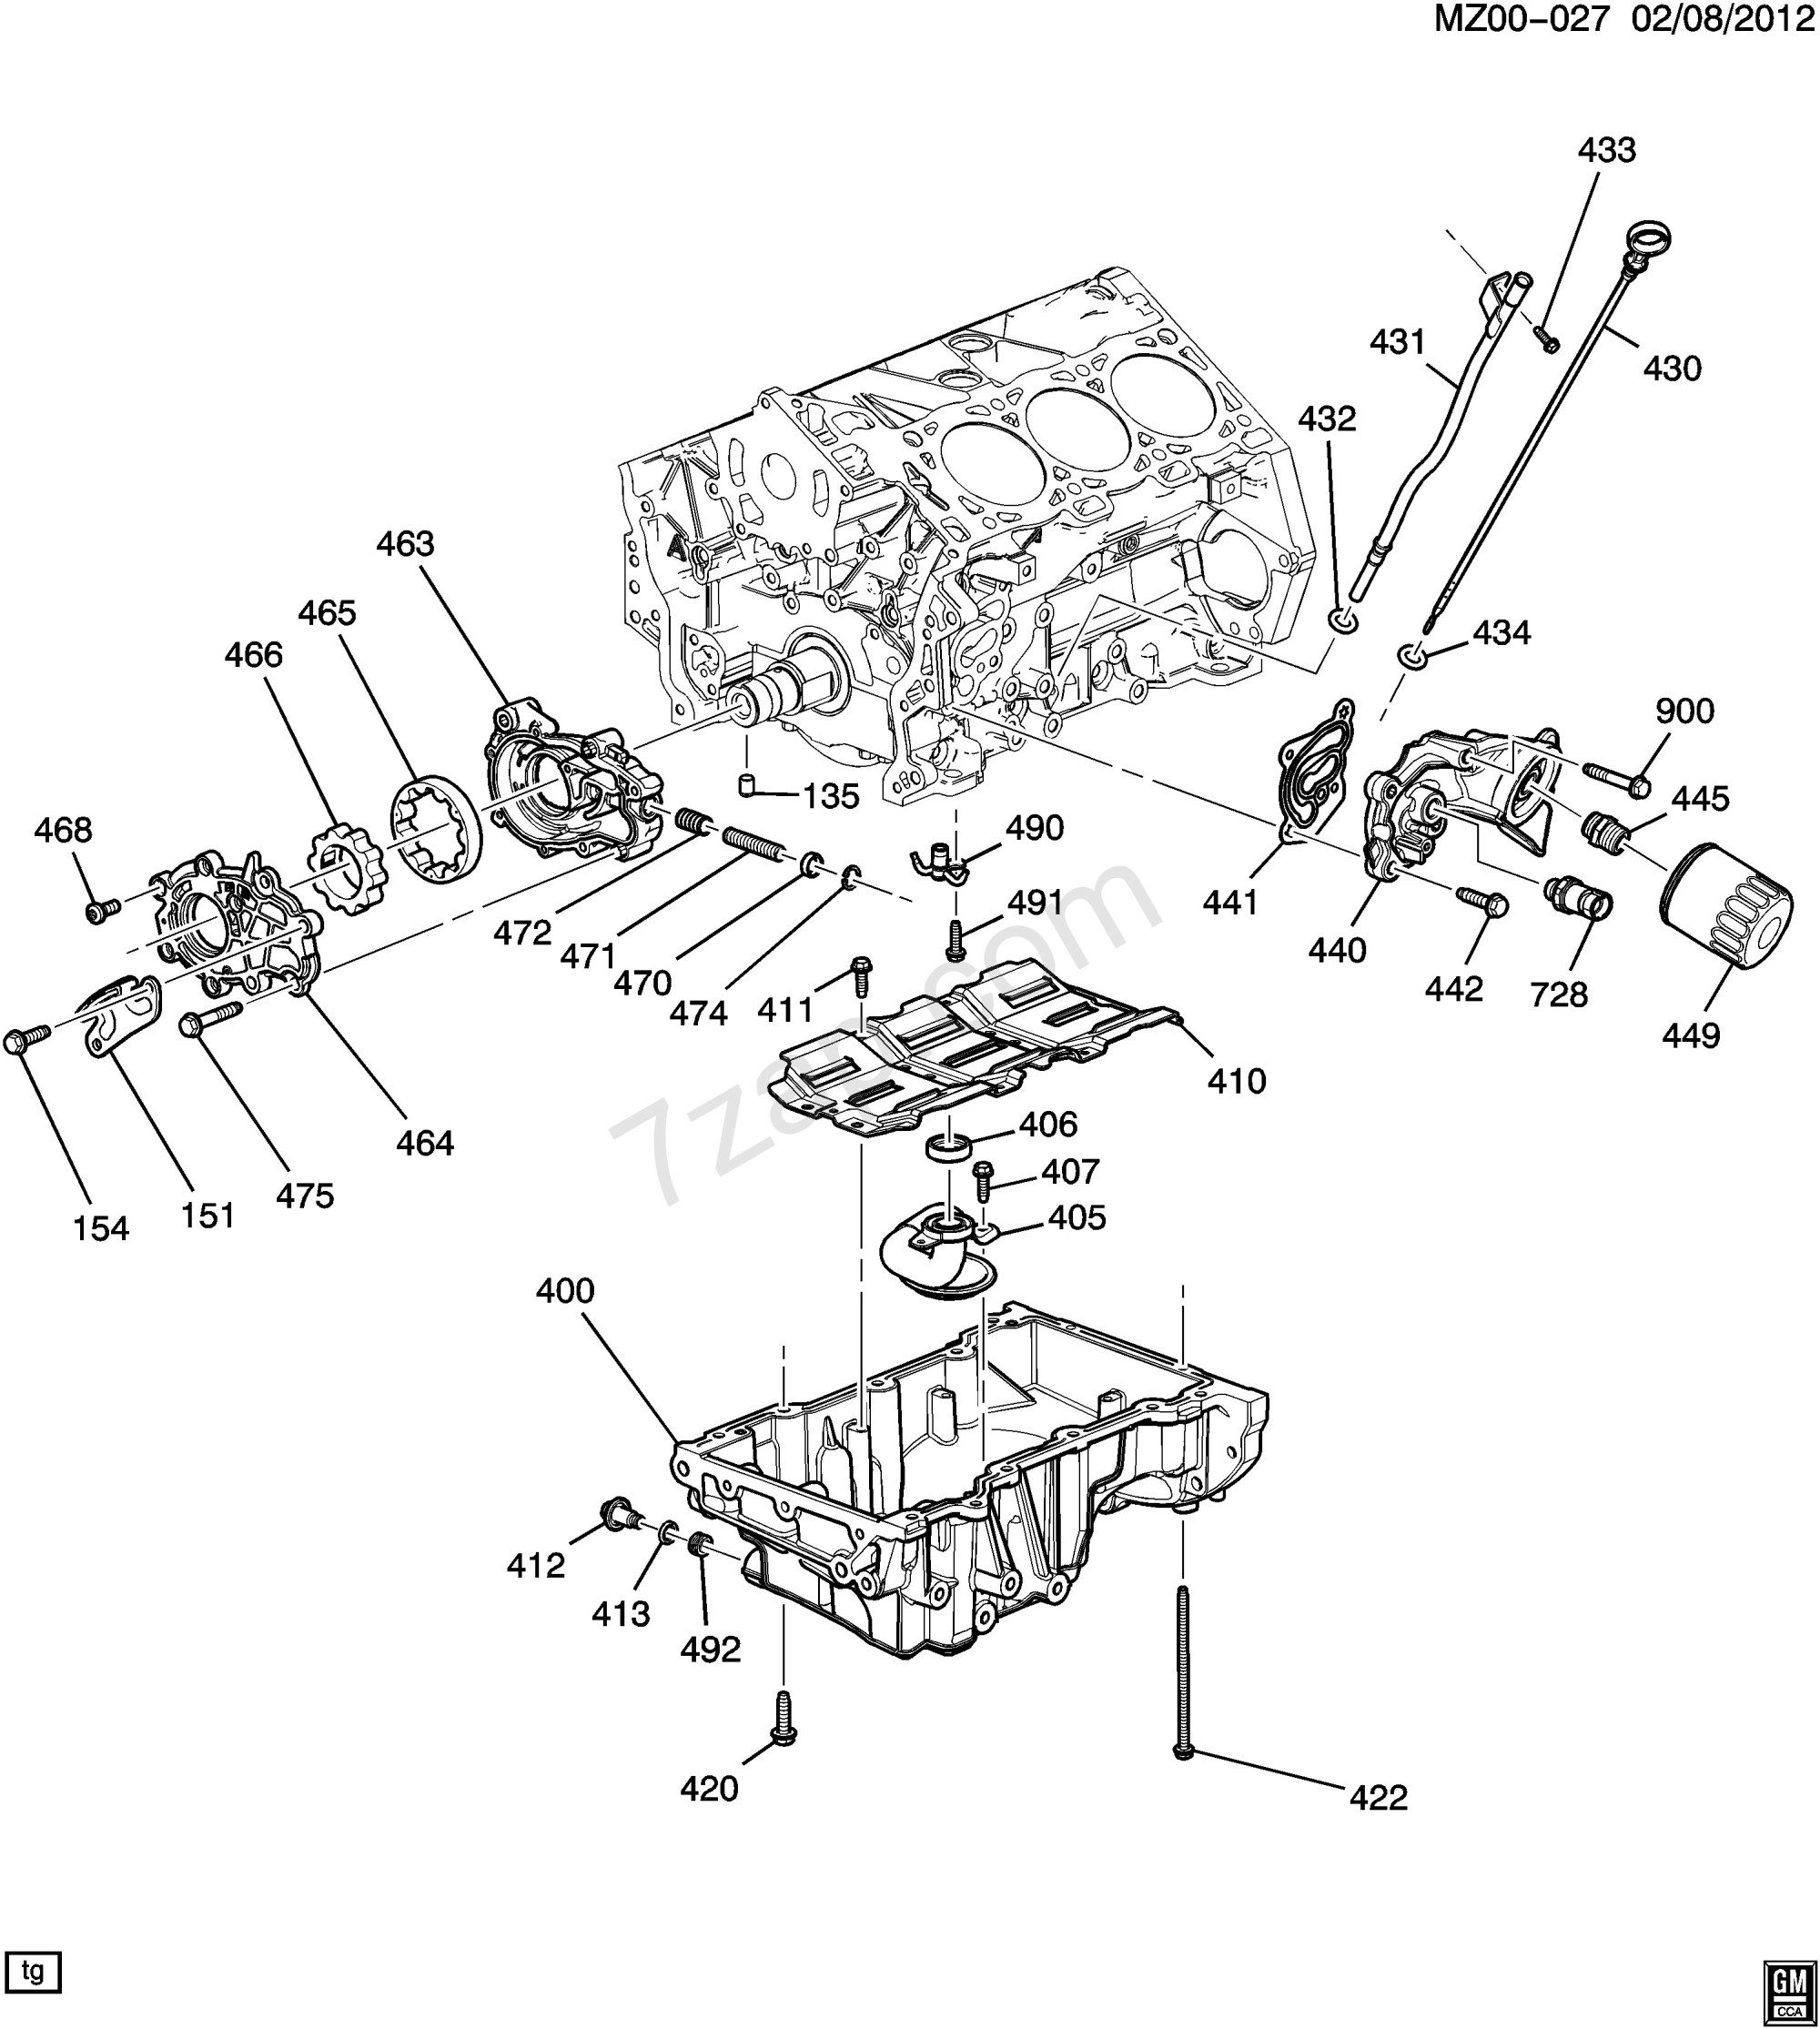 hight resolution of chevy 3 6l engine diagram wiring diagram yer 3 6l v6 engine diagram